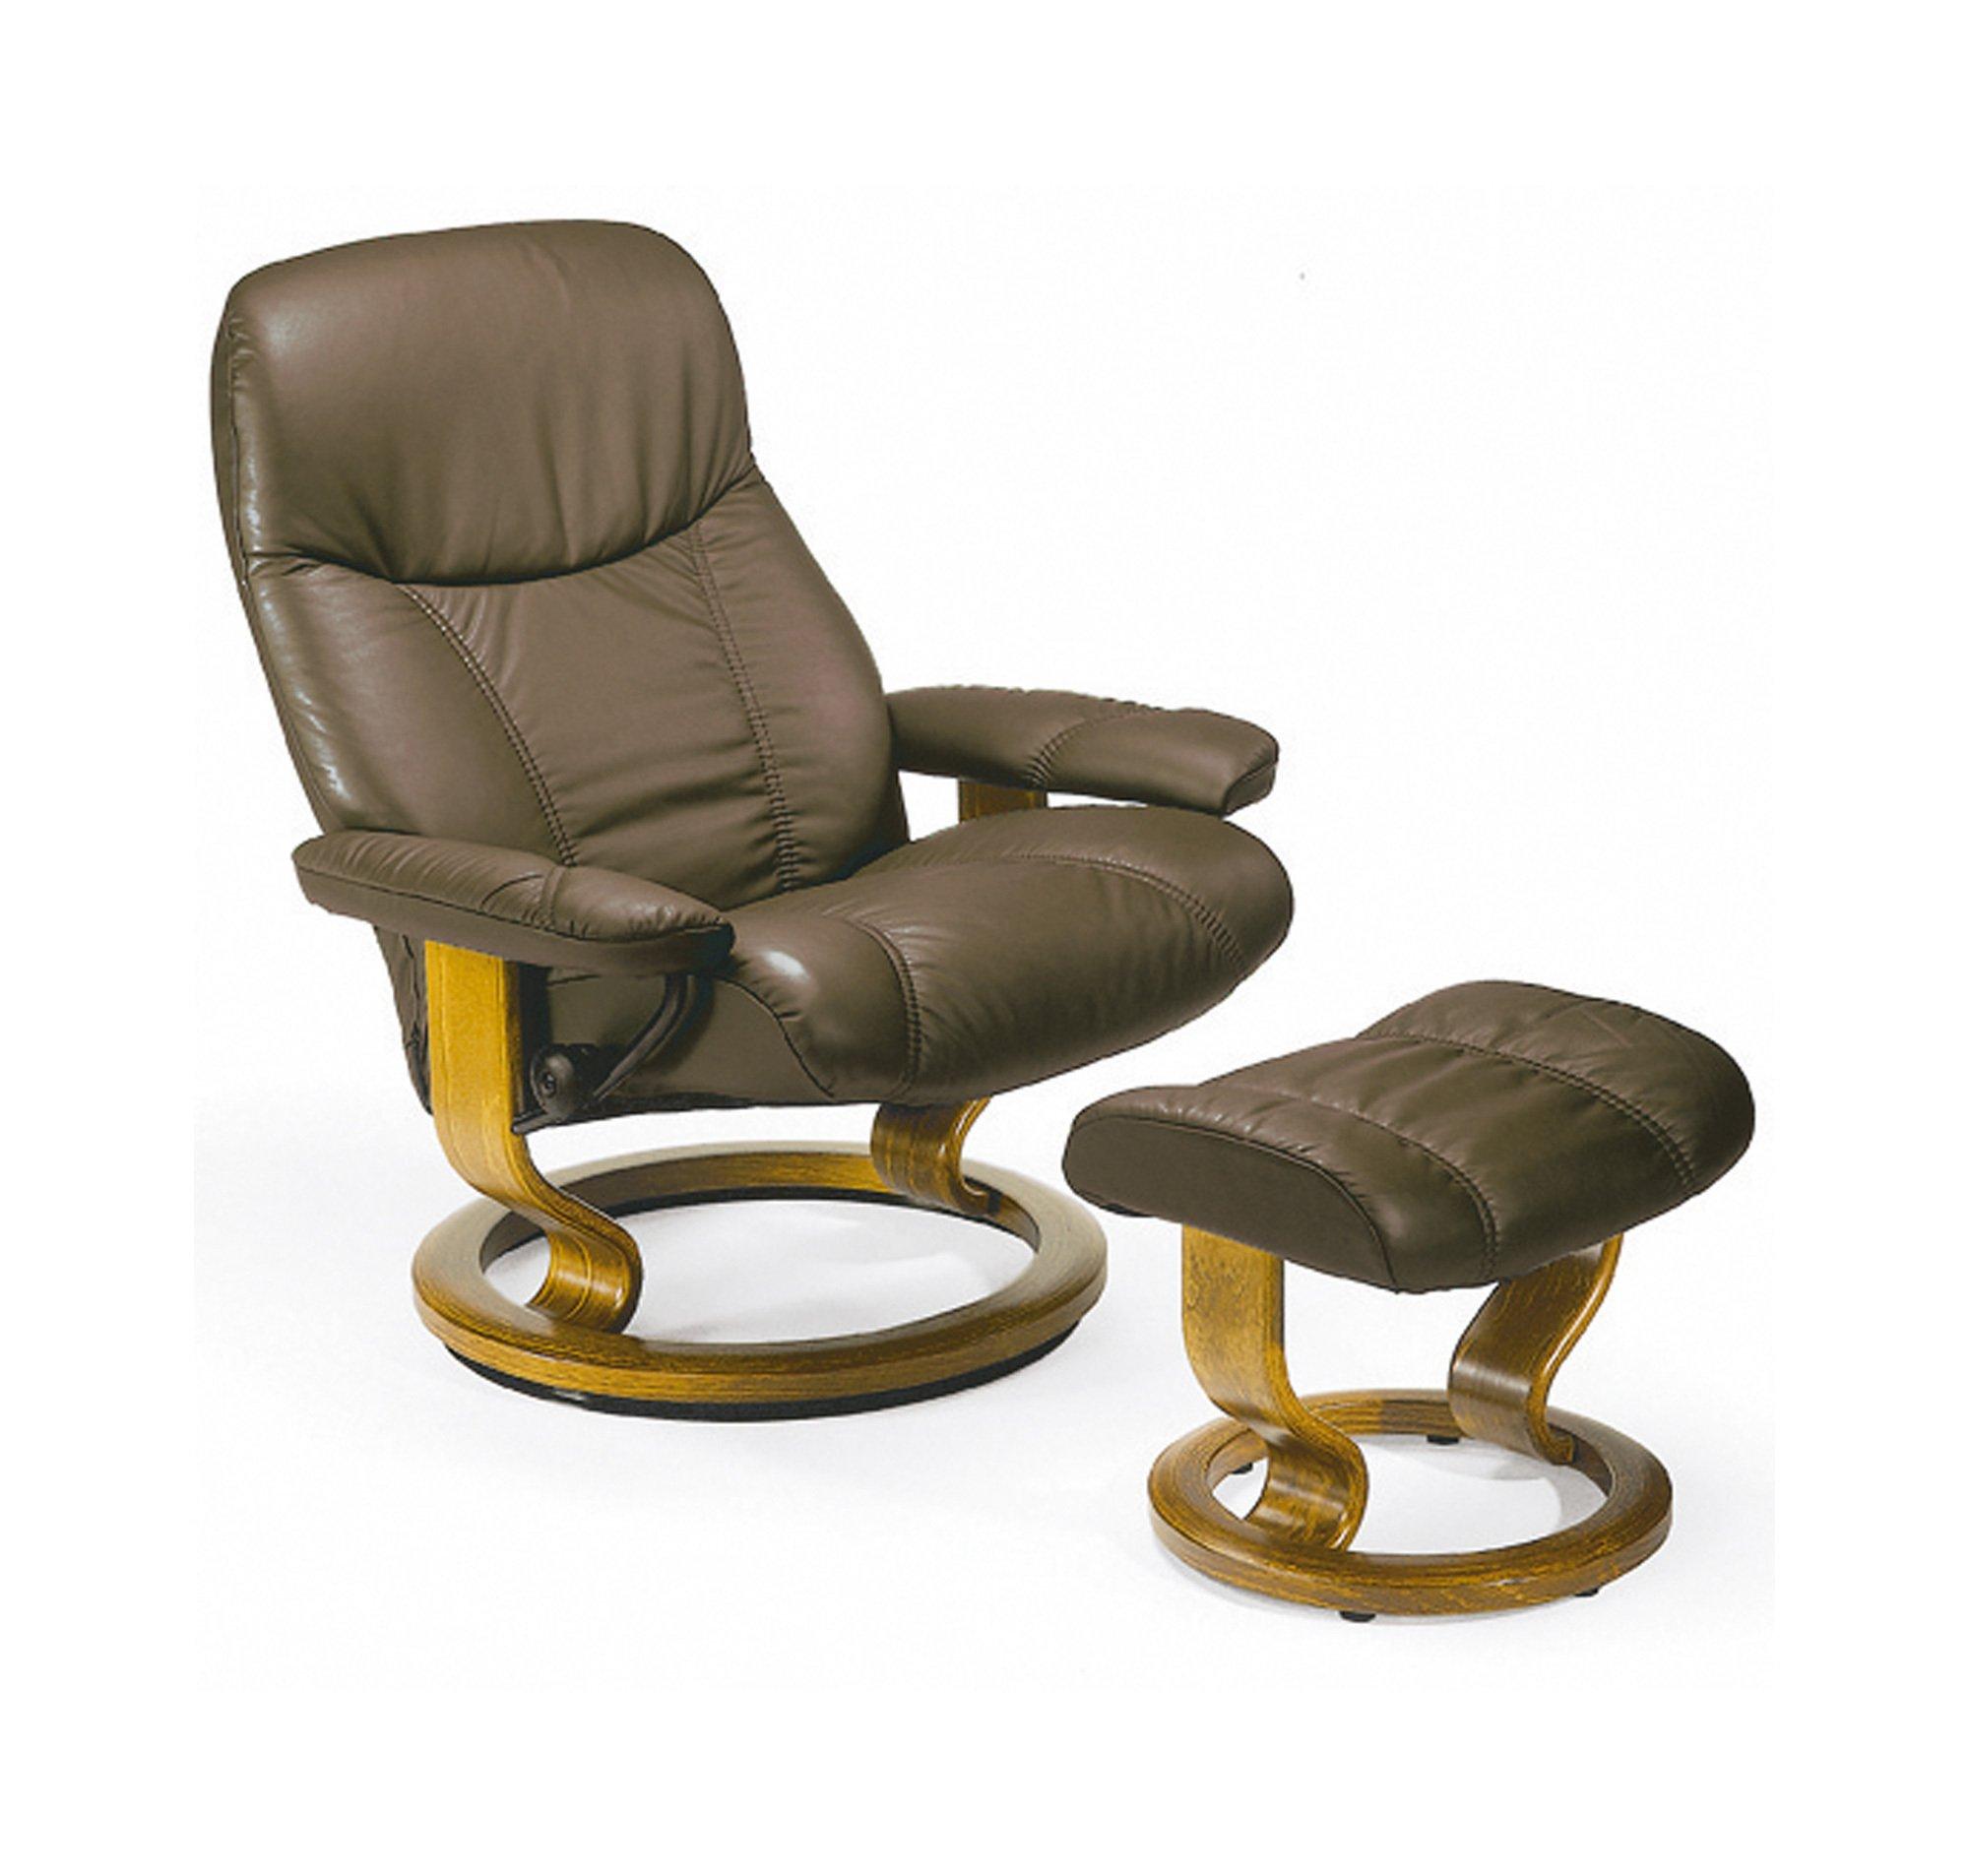 stressless consul l tuoli rahi stressless tv tuolit lepotuolit tuotteet maskun. Black Bedroom Furniture Sets. Home Design Ideas